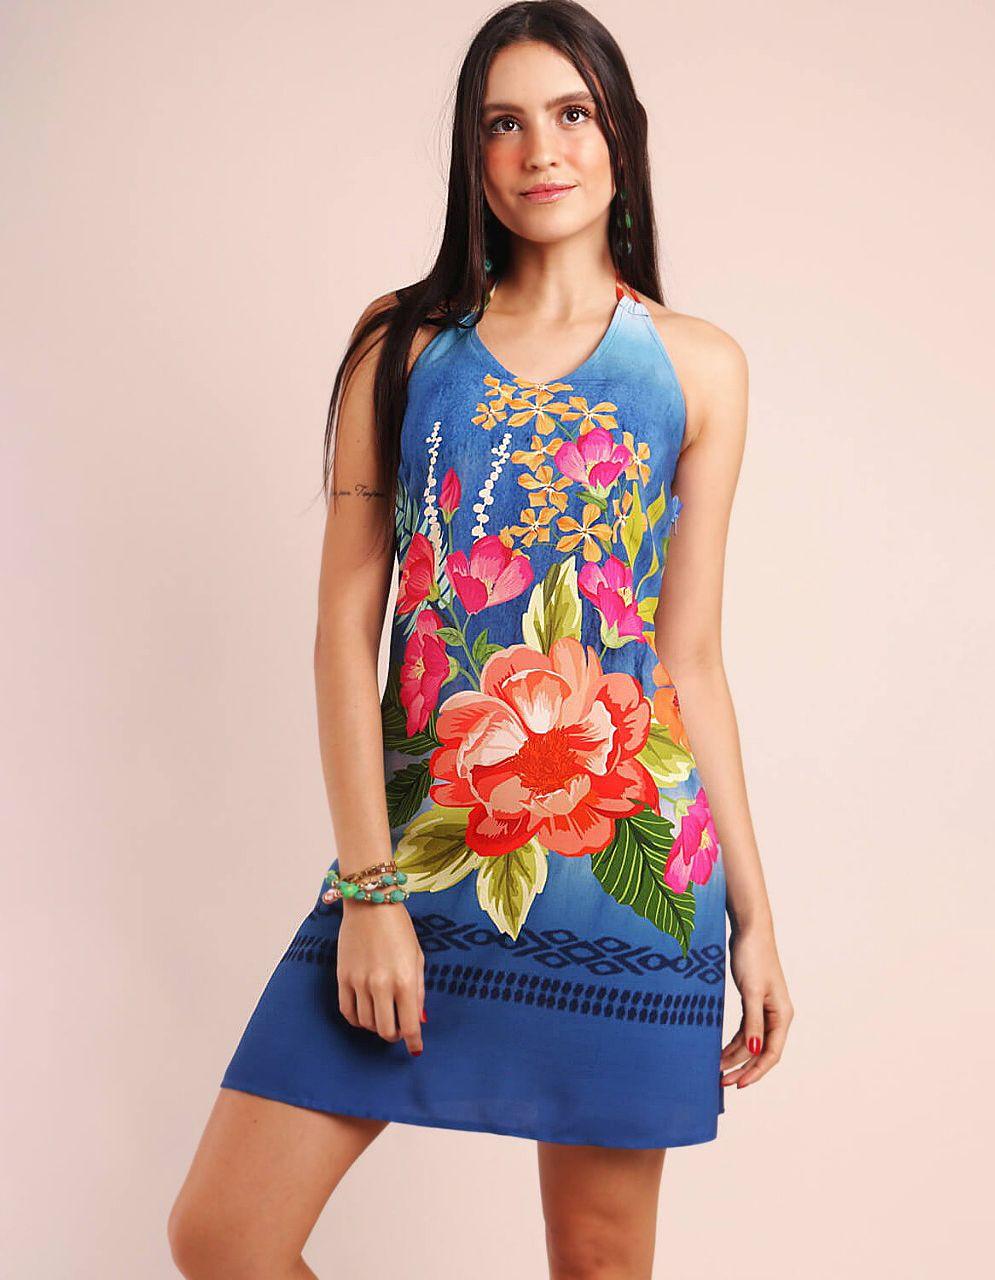 Vestido verano corto azul o amarillo con tirantes y cuello halter Malagueta-72085MAL-A